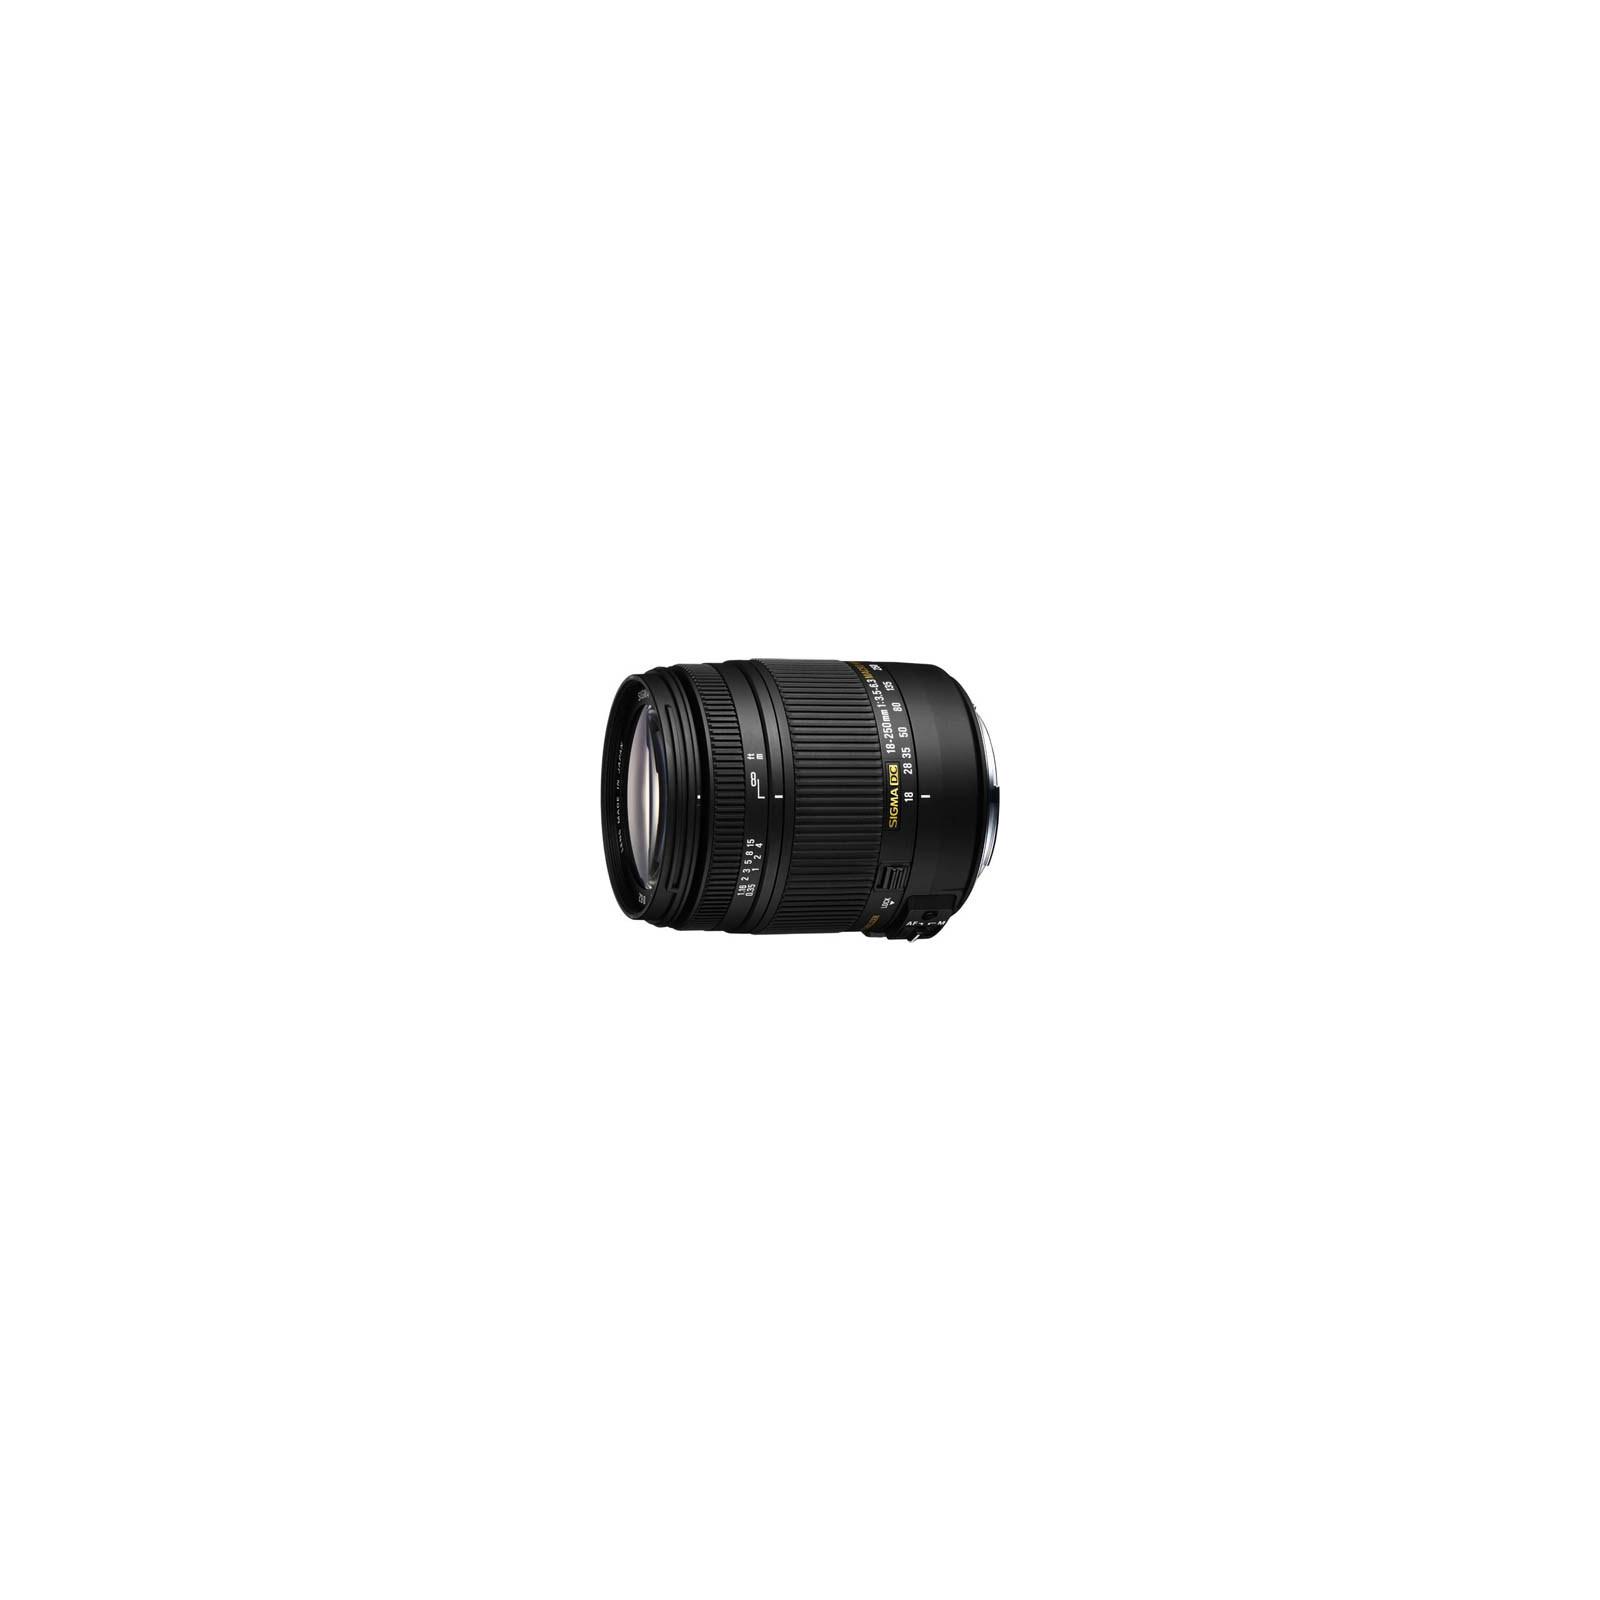 Объектив Sigma 18-250/3.5-6.3DC macro OS HSM for Canon (883954)